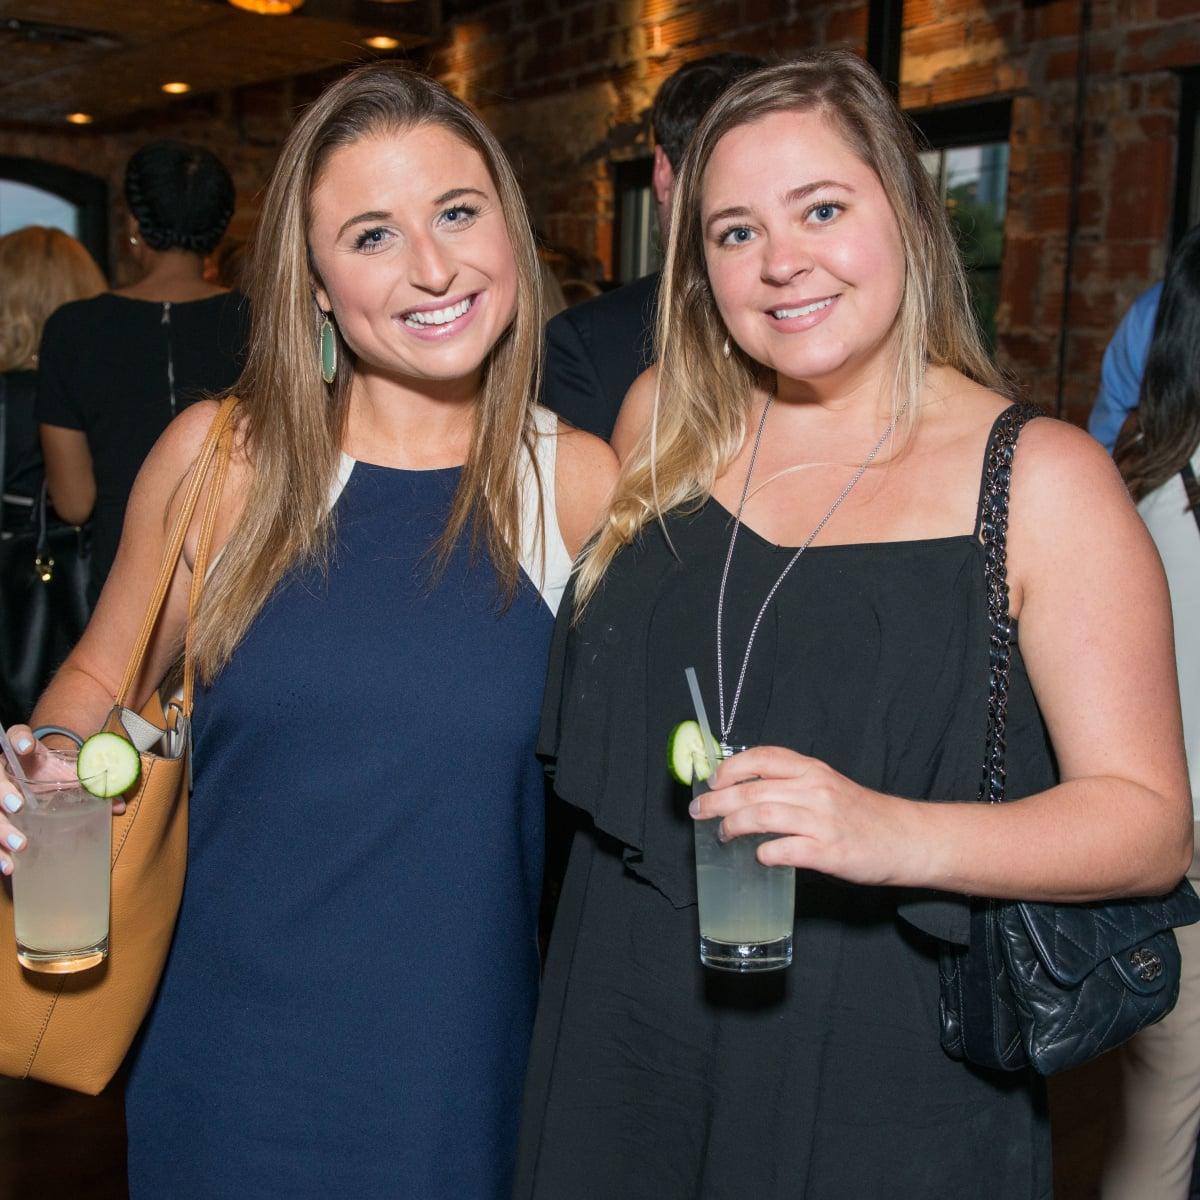 News, Shelby, CultureMap Social, B&B Butchers, Sept. 2015 Megan Lesser, Natalie Burrows